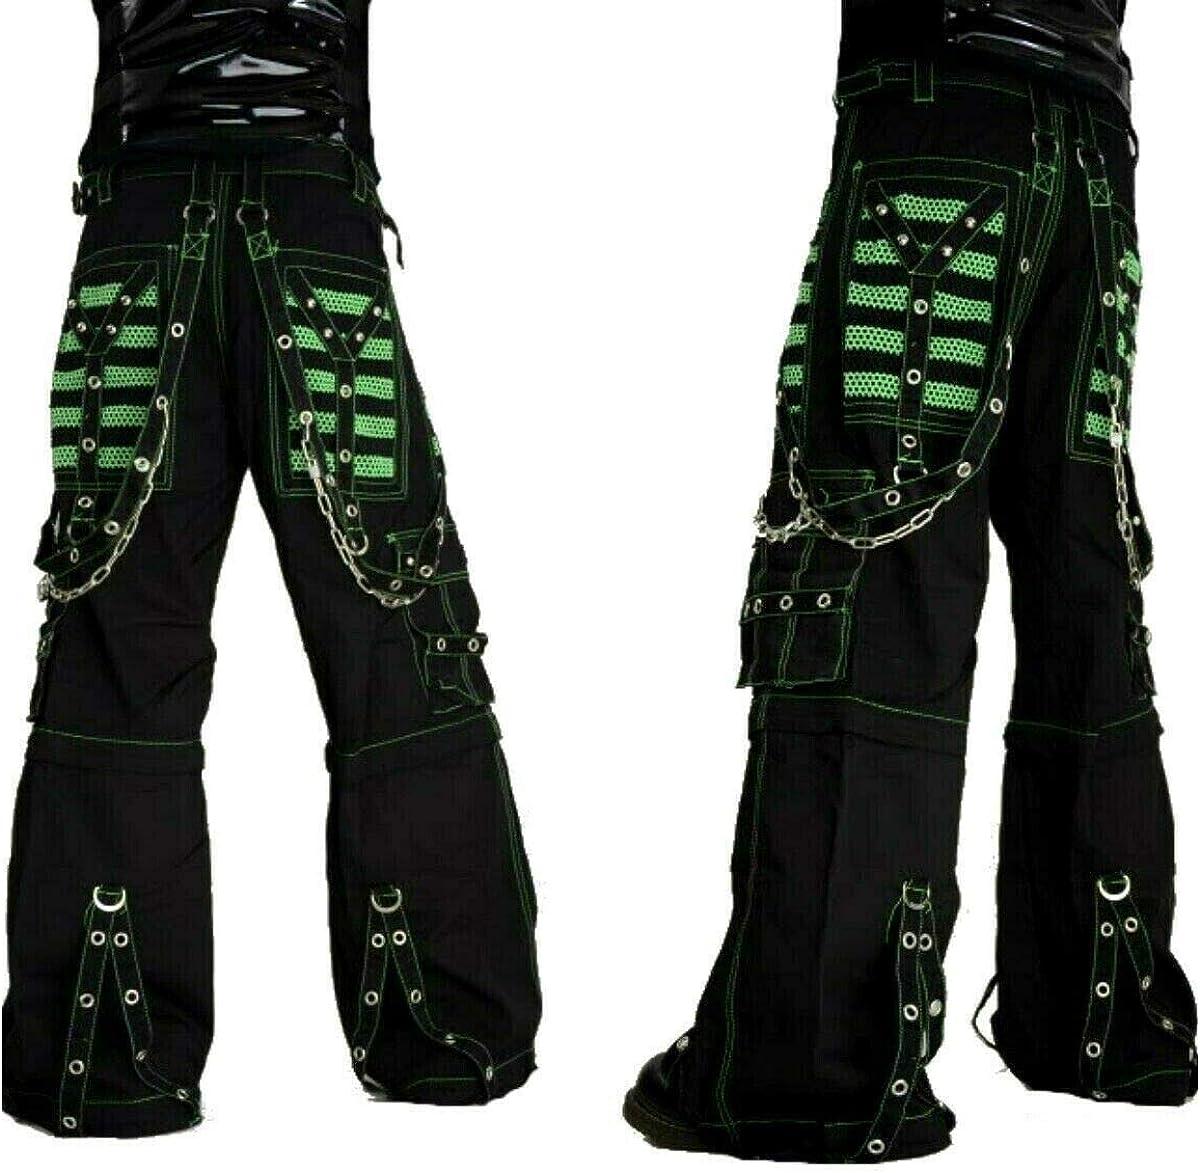 Prime ご予約品 Quality ふるさと割 Men Extreme Bondage Rocker Skater Gothic Punk Cybe